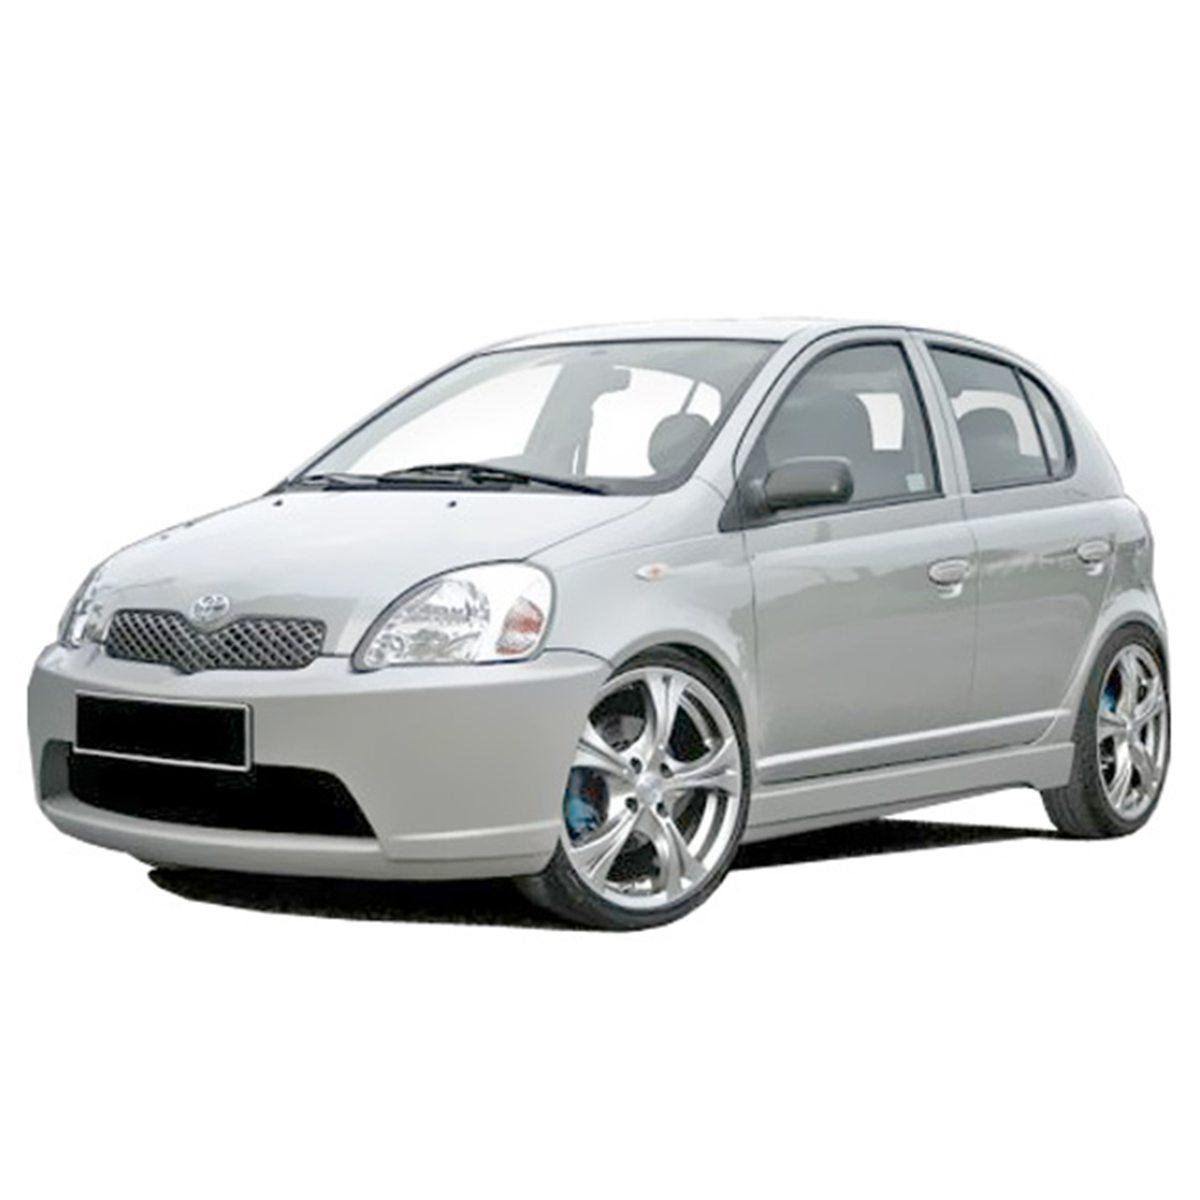 Toyota-Yaris-2003-Imagine-frt-PCS225